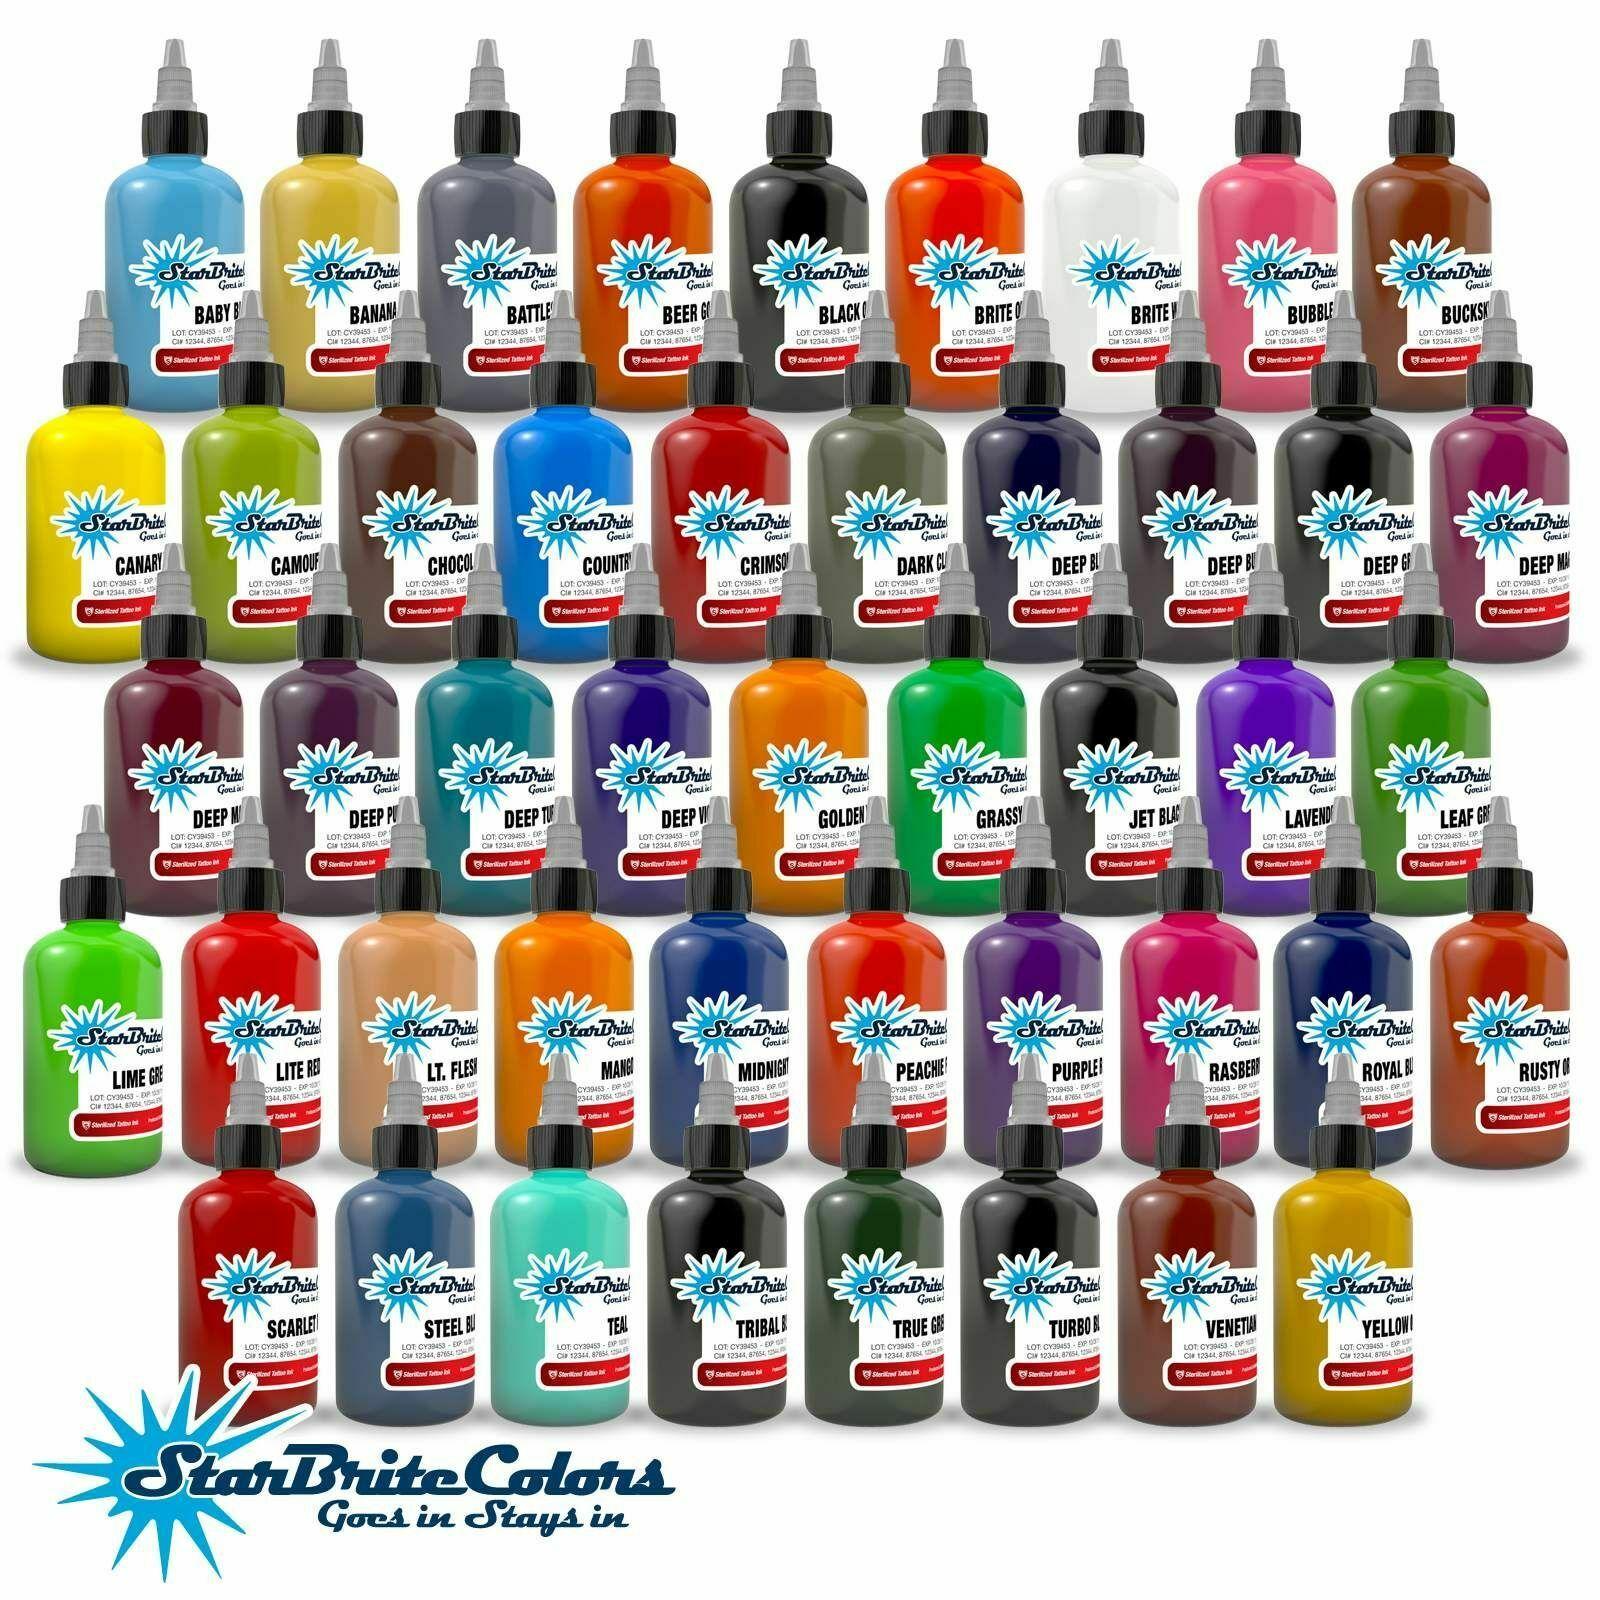 StarBrite Colors Tattoo Ink Top Seller 1/2 oz / 1 oz